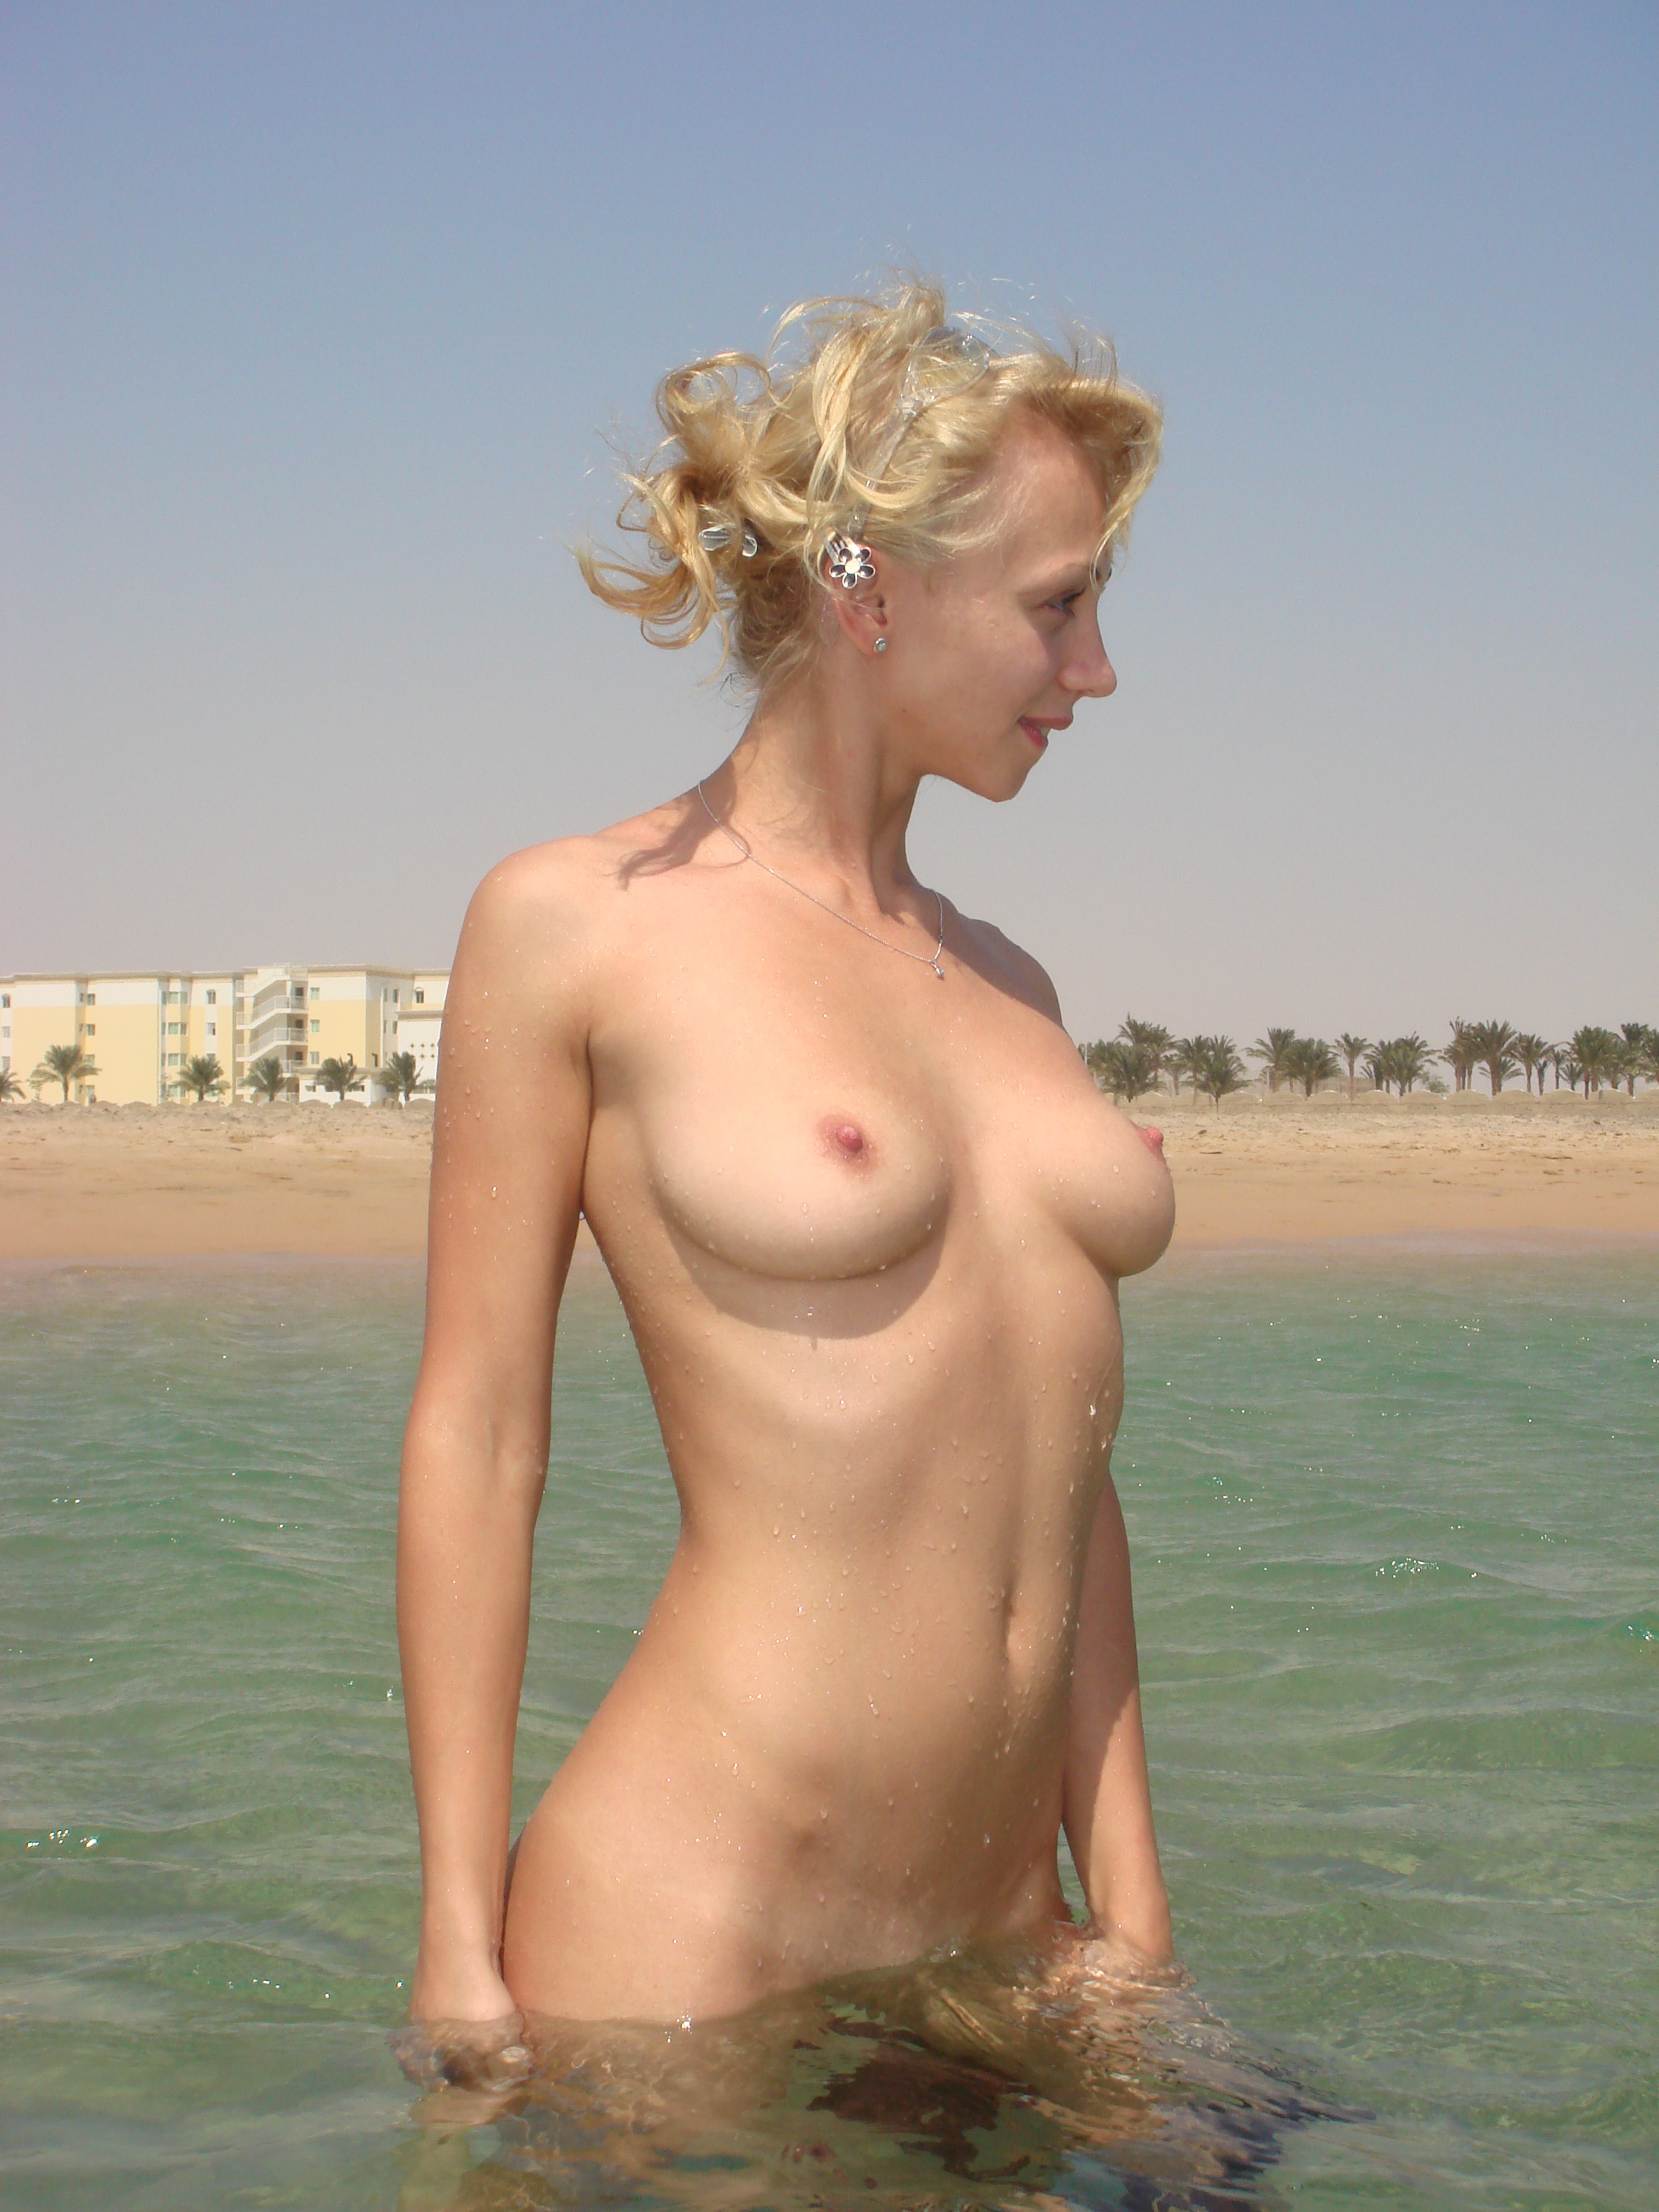 Частное порно фото с отпуска